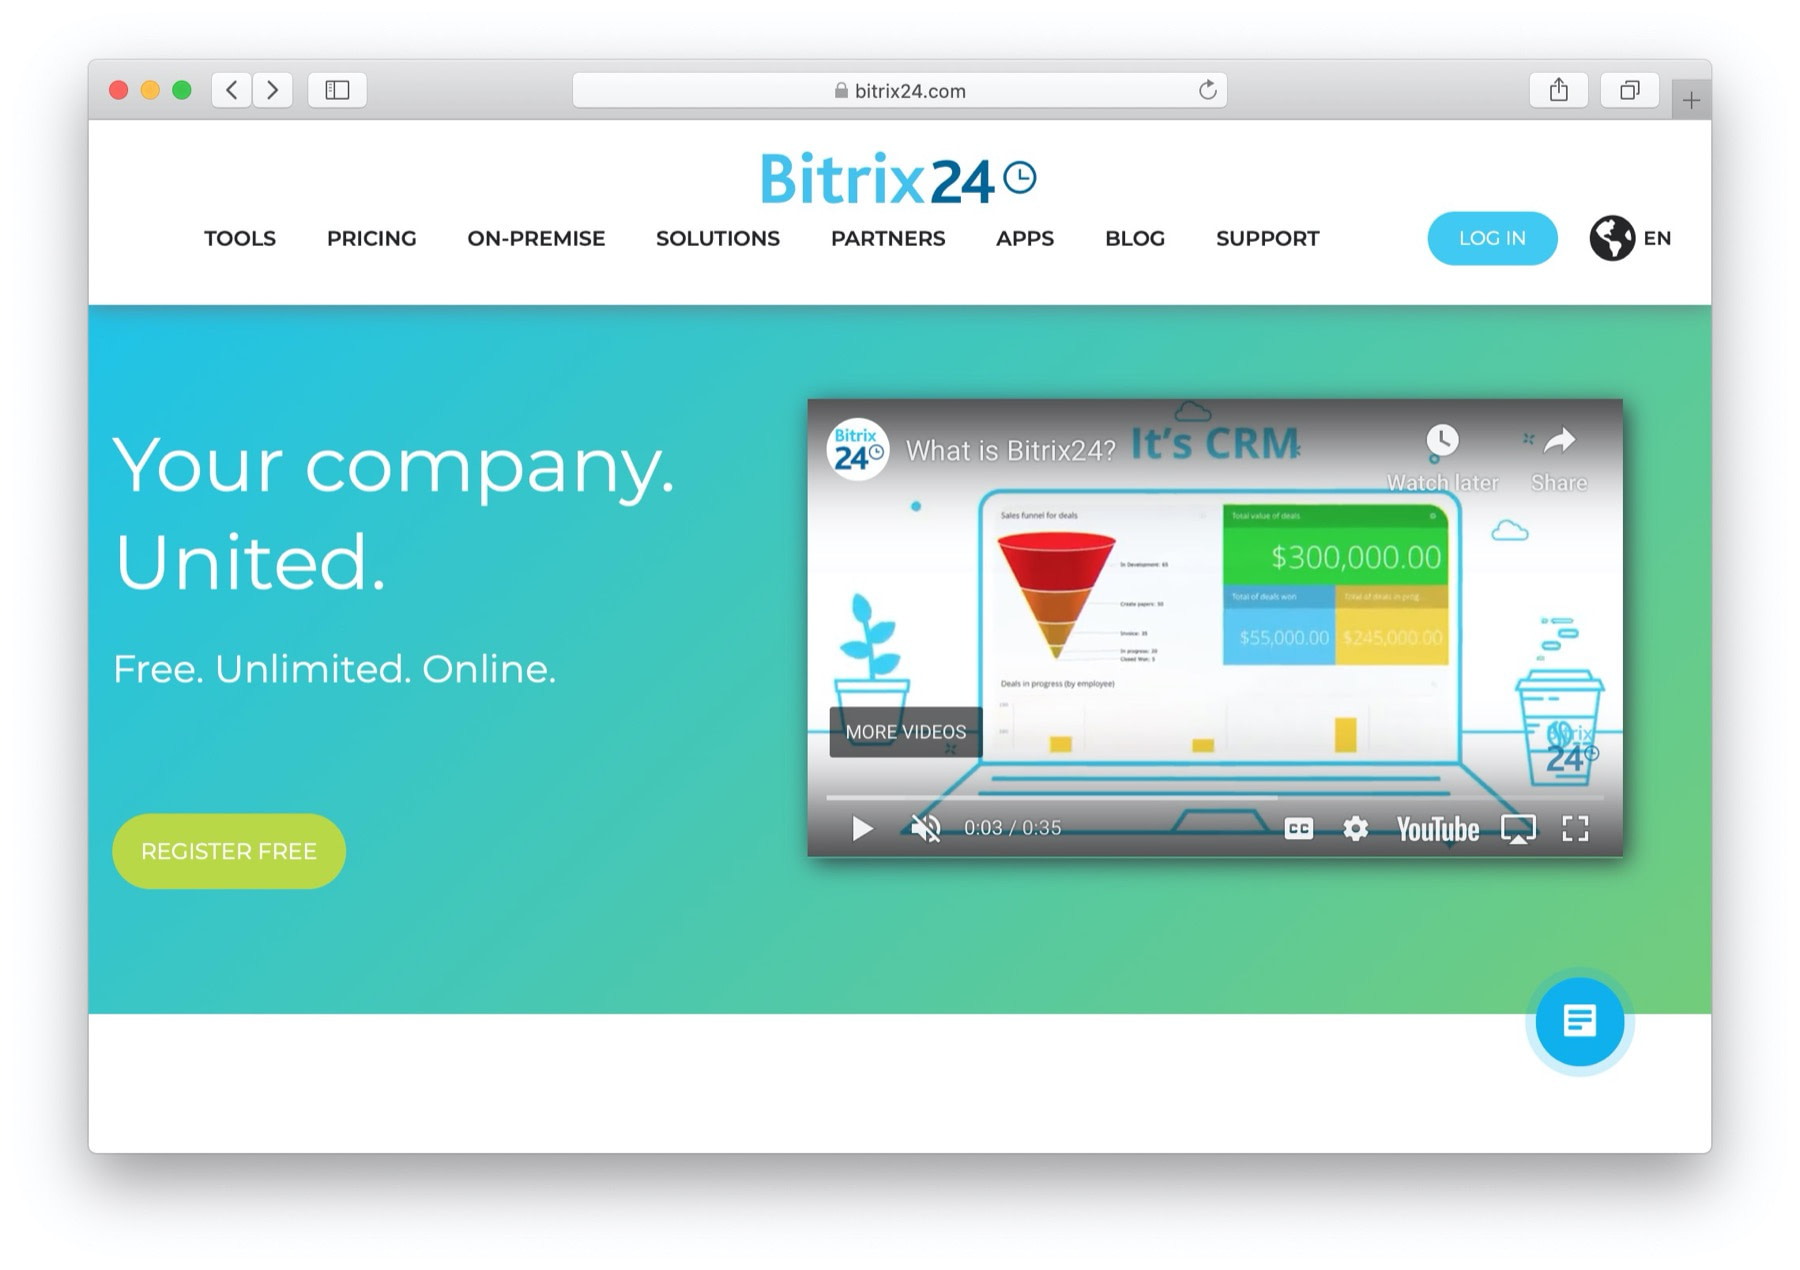 Best CRM software: bitrix24